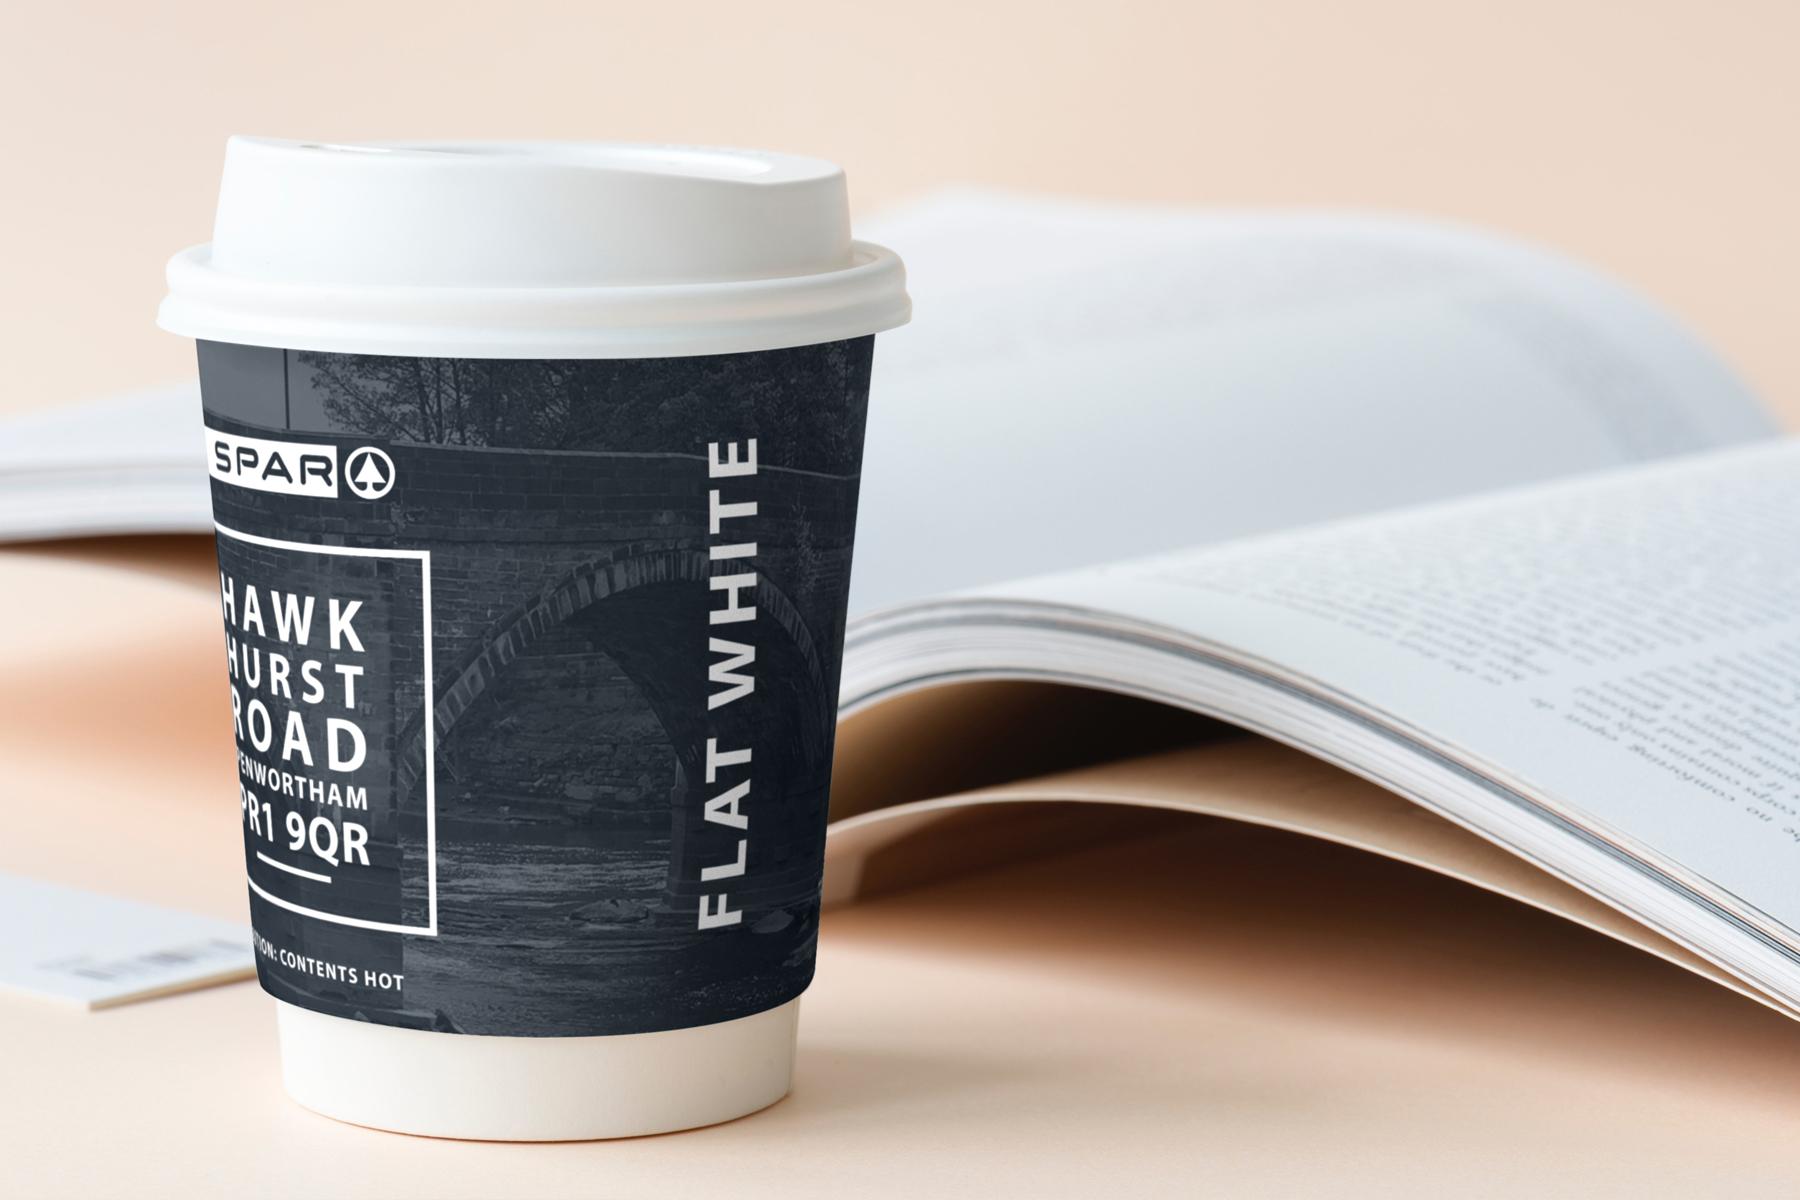 spar hawkhurst road flat white coffee cup